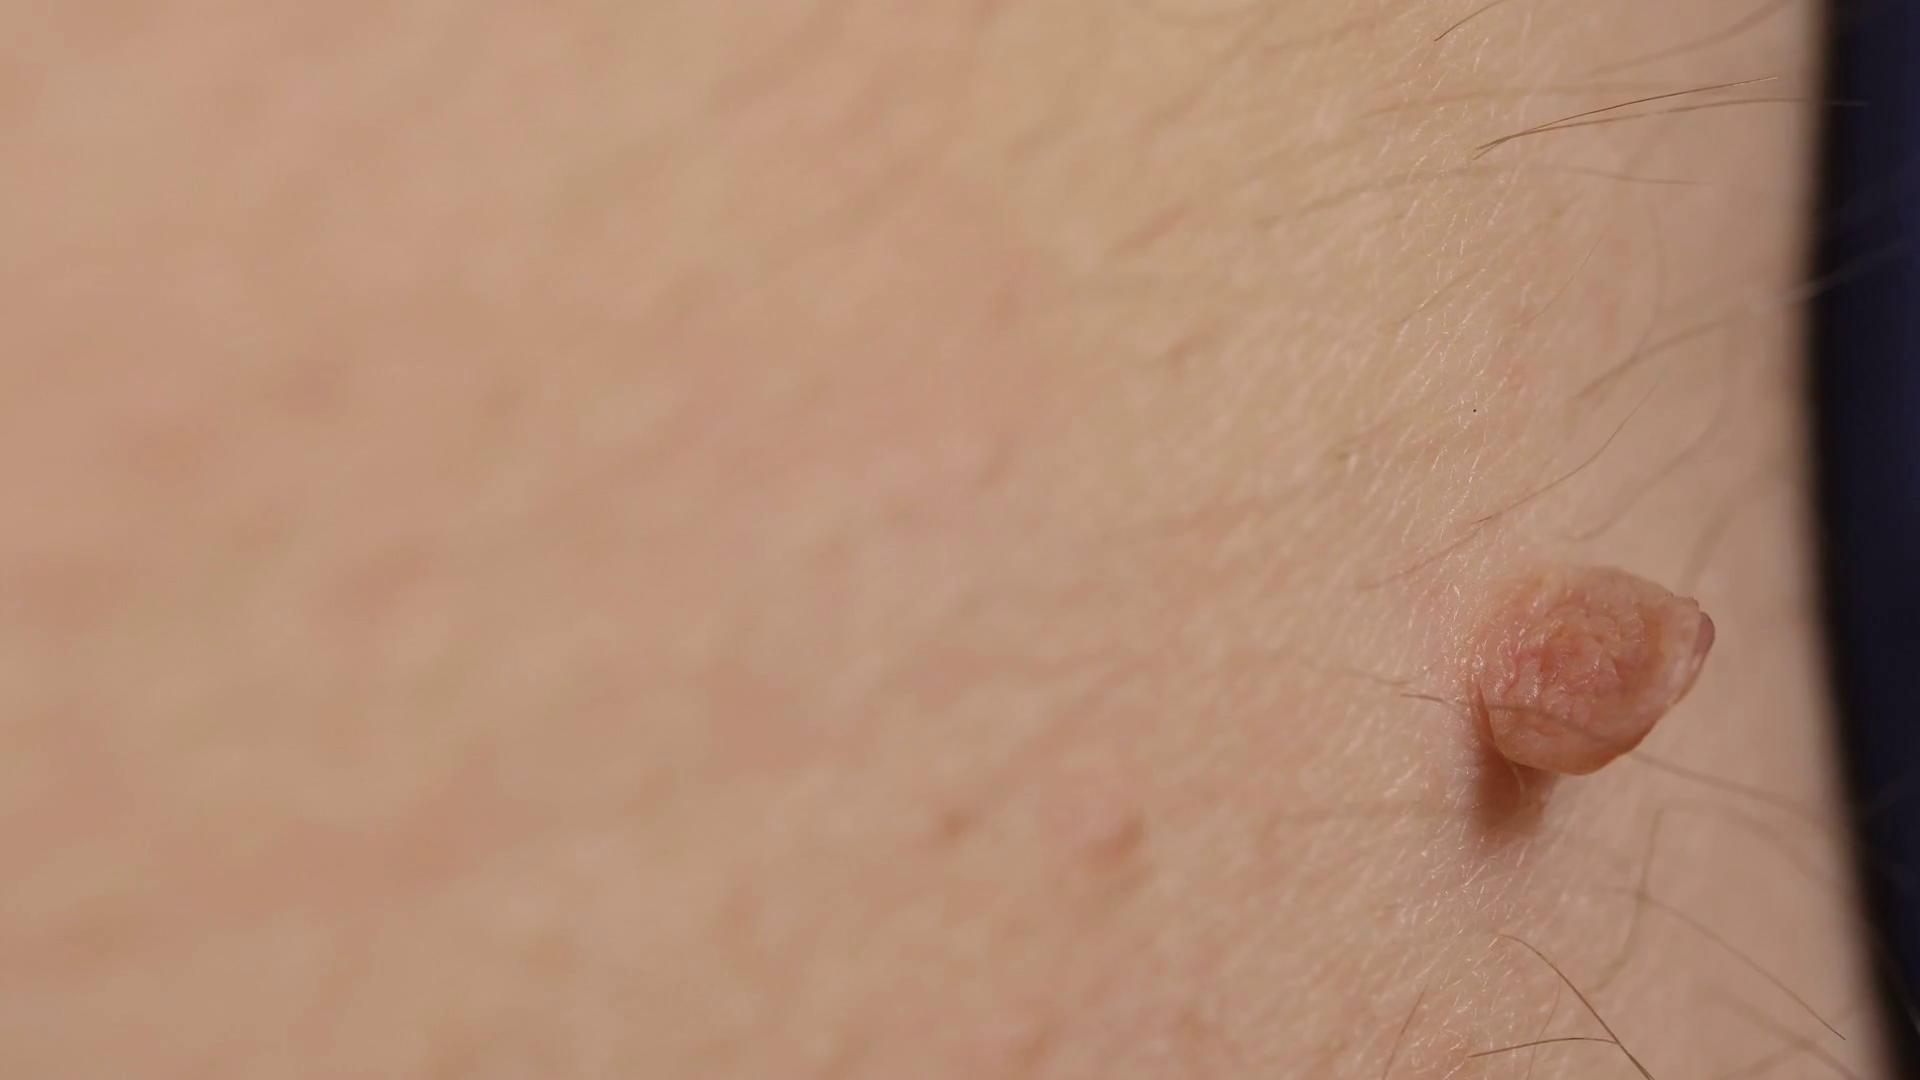 Papilloma on body, Traducere